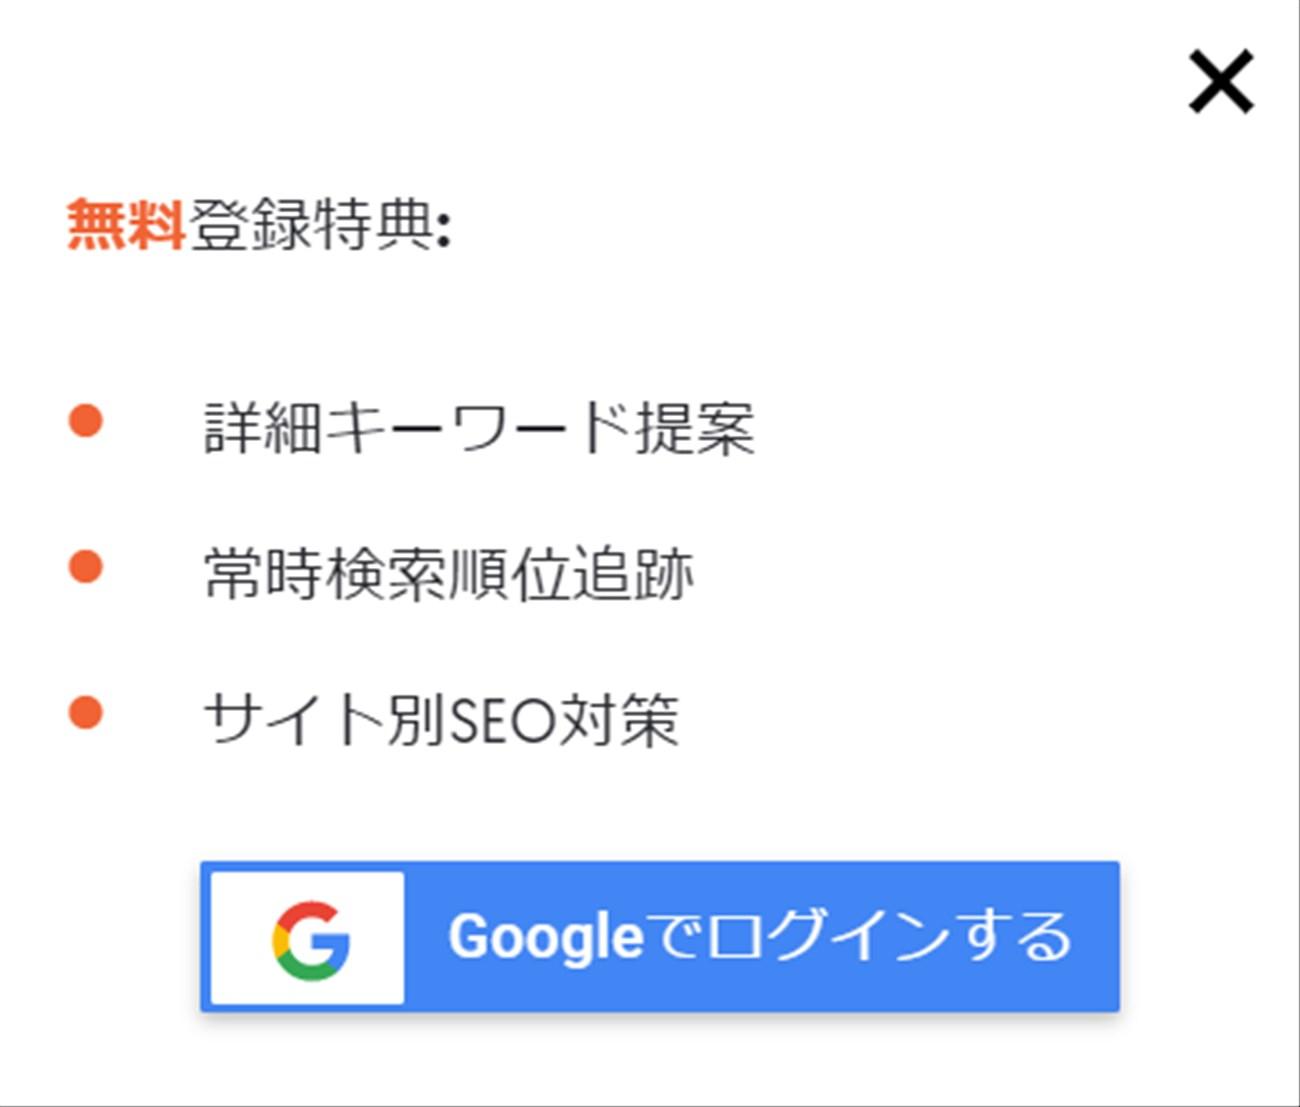 UbersuggestにGoogleログインする特典